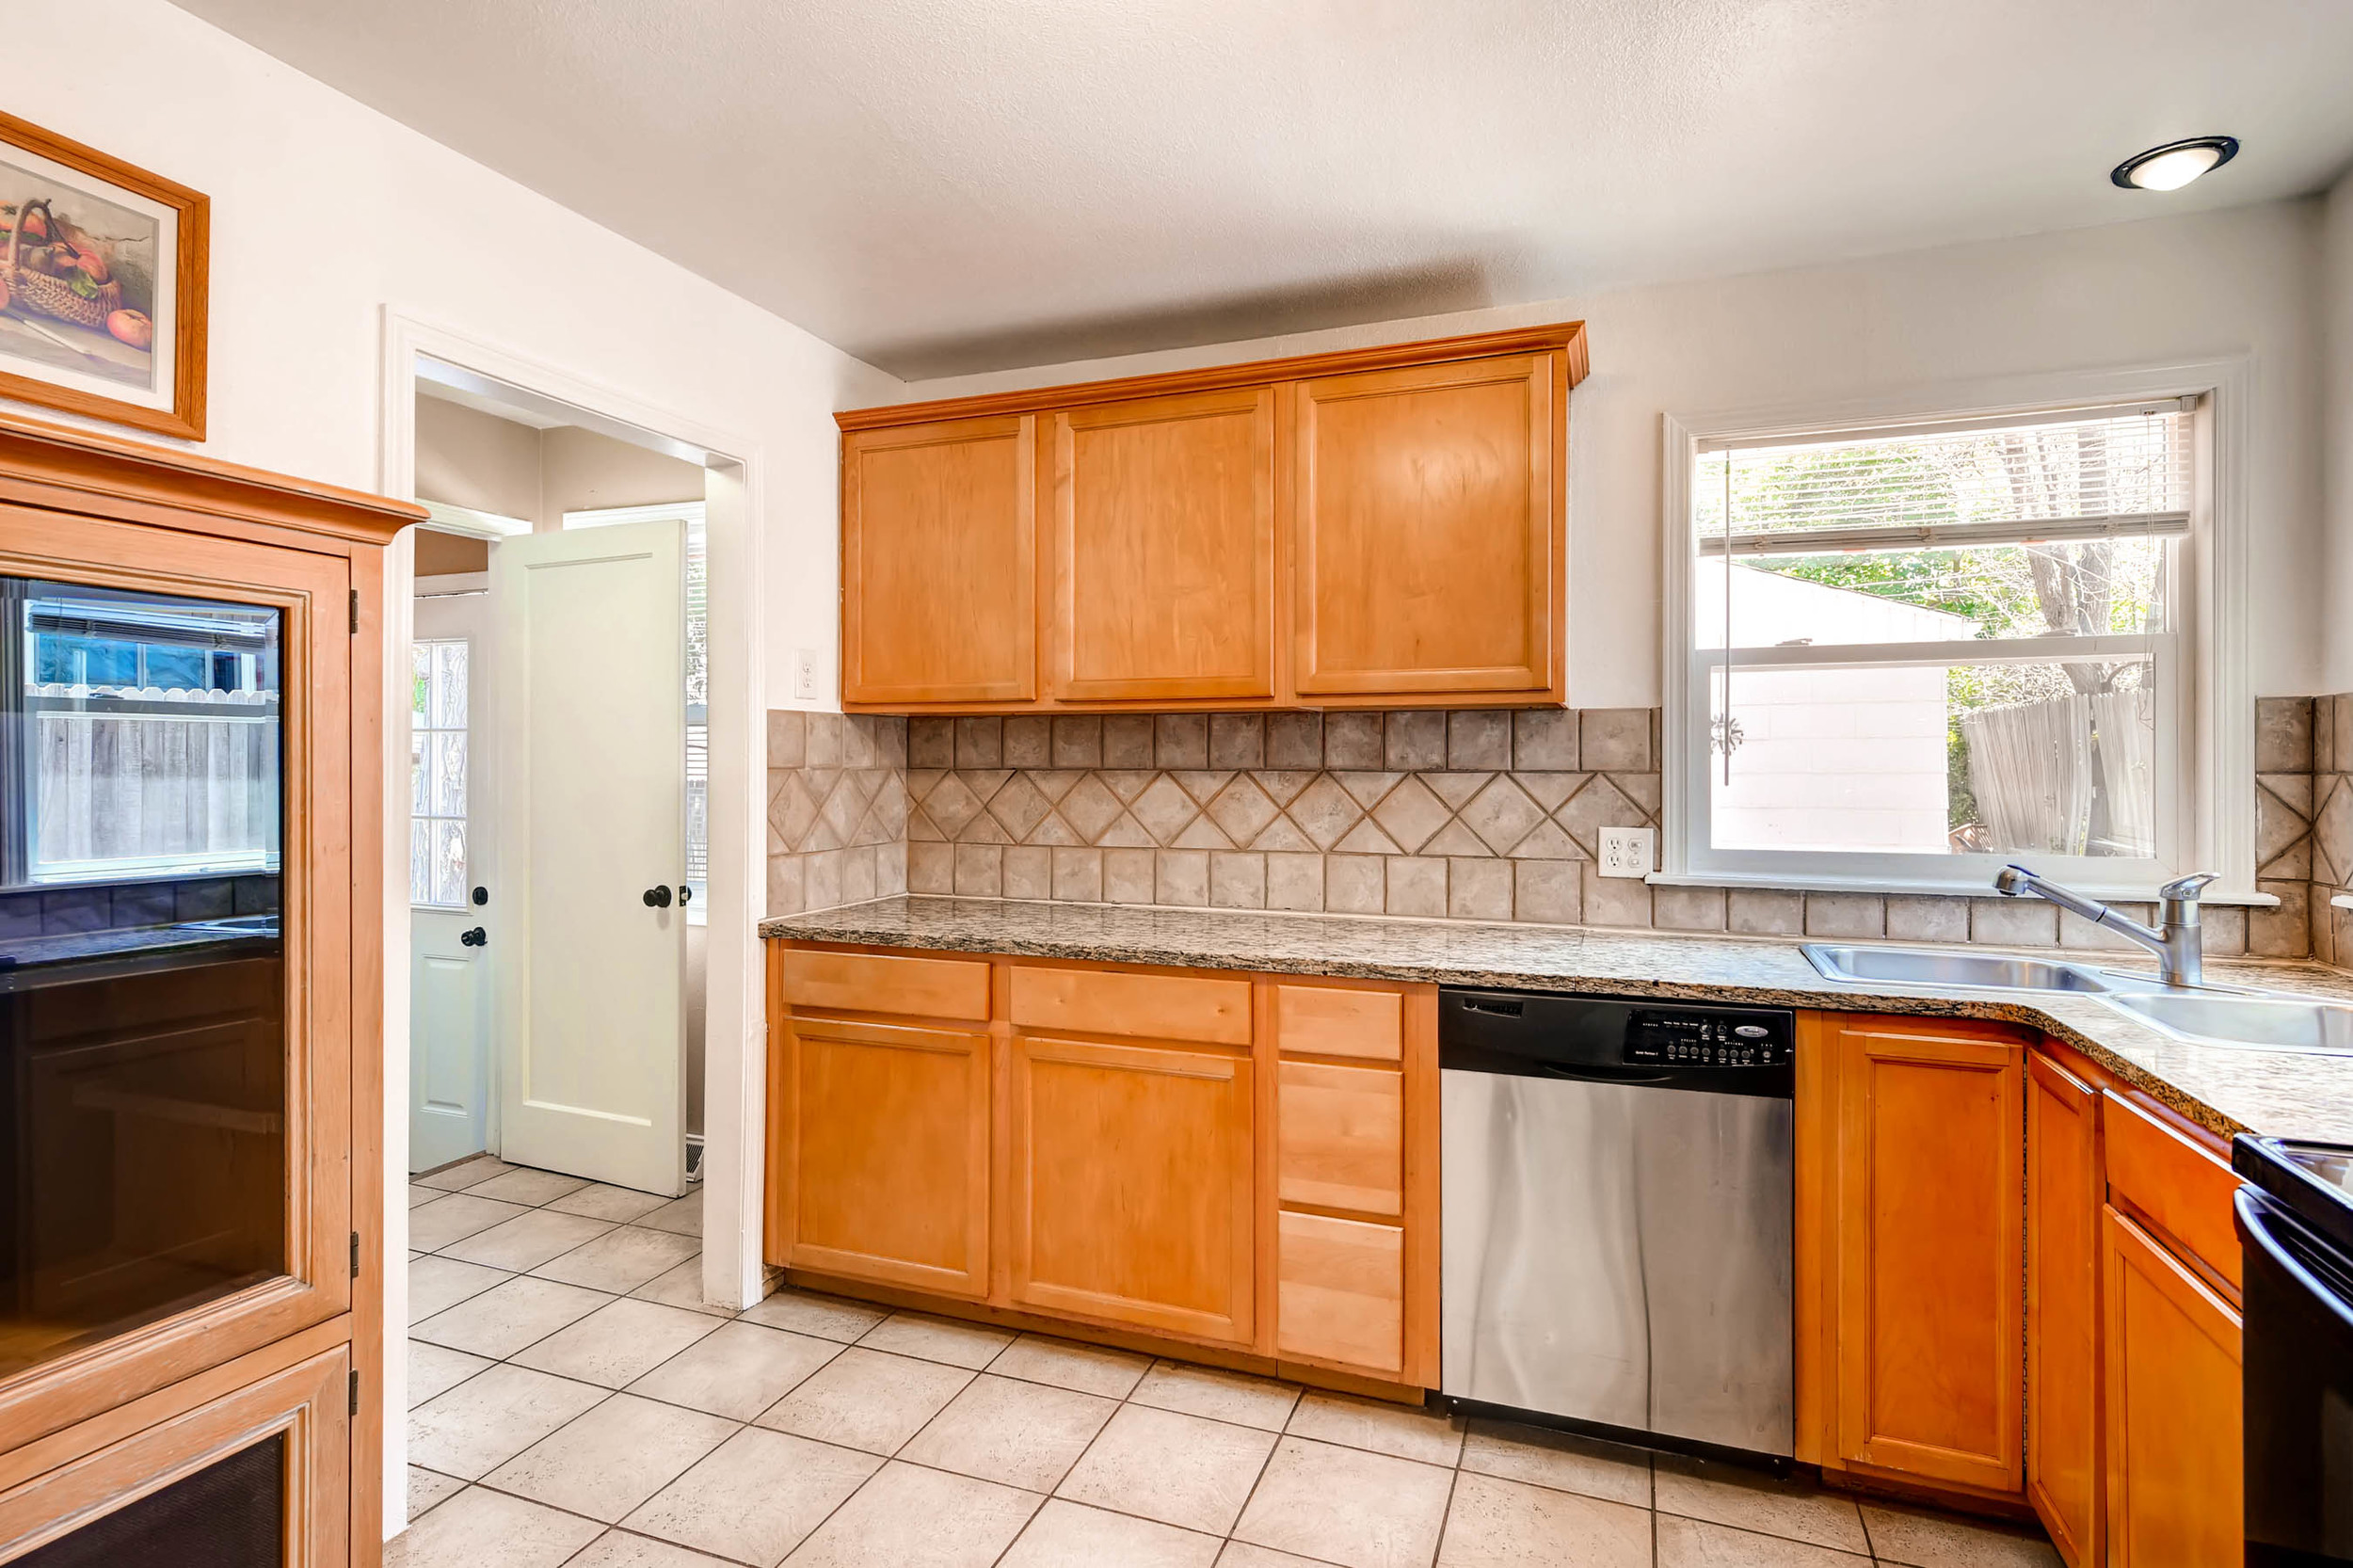 4224 S Cherokee St Englewood-print-013-15-Kitchen-2700x1799-300dpi.jpg